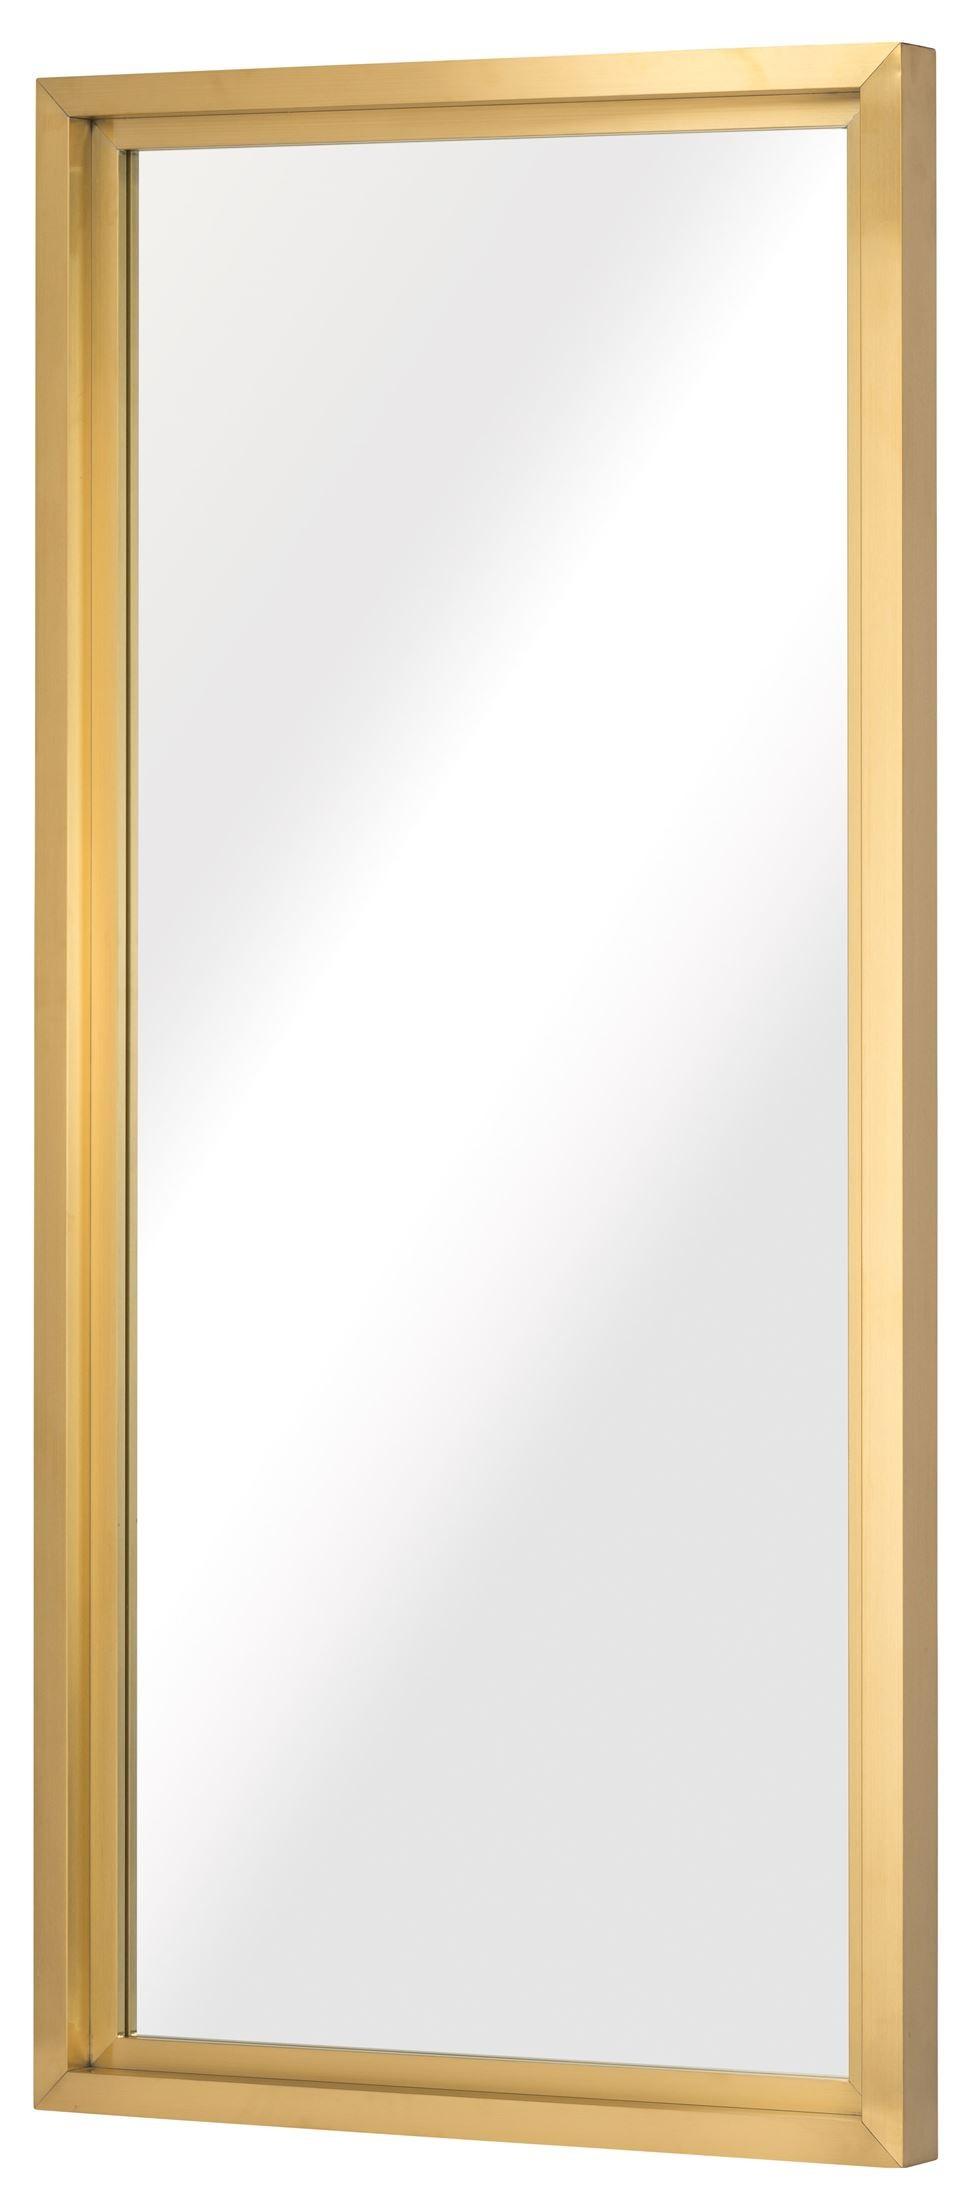 Glam gold metal floor mirror hgsx299 nuevo for Gold floor standing mirror